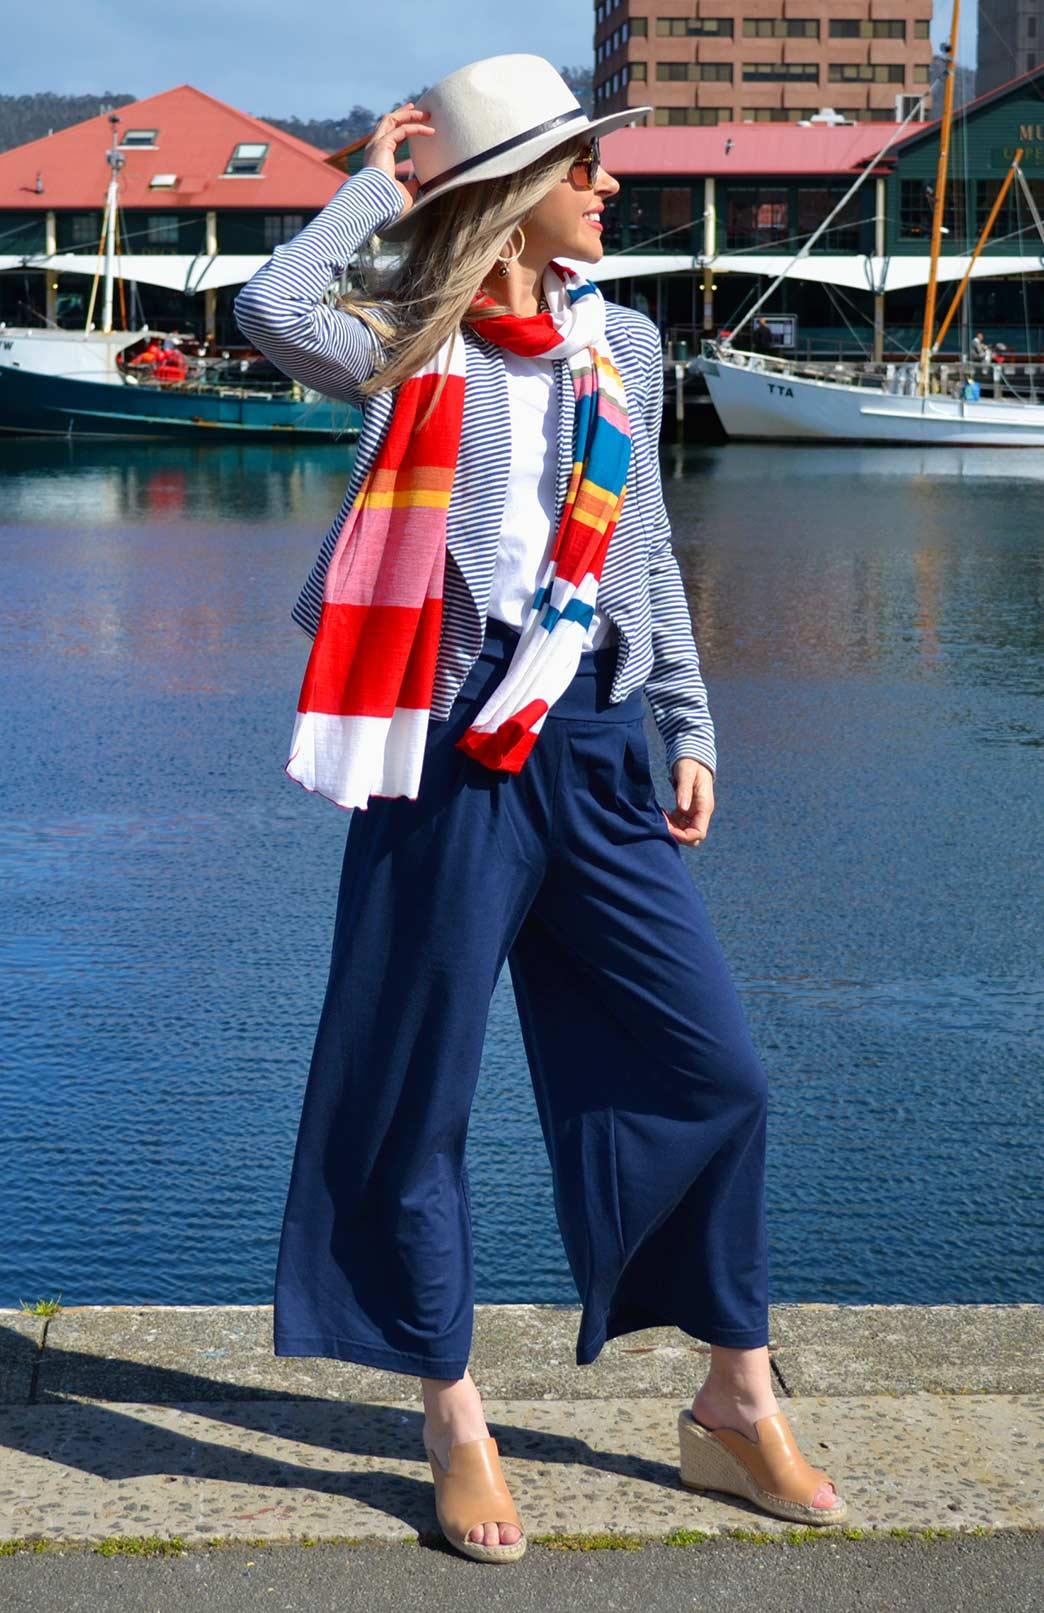 Wide Leg Crop Pant - Plain - Women's Merino Wool Crop Pants with Wide Legs and Waistband - Smitten Merino Tasmania Australia